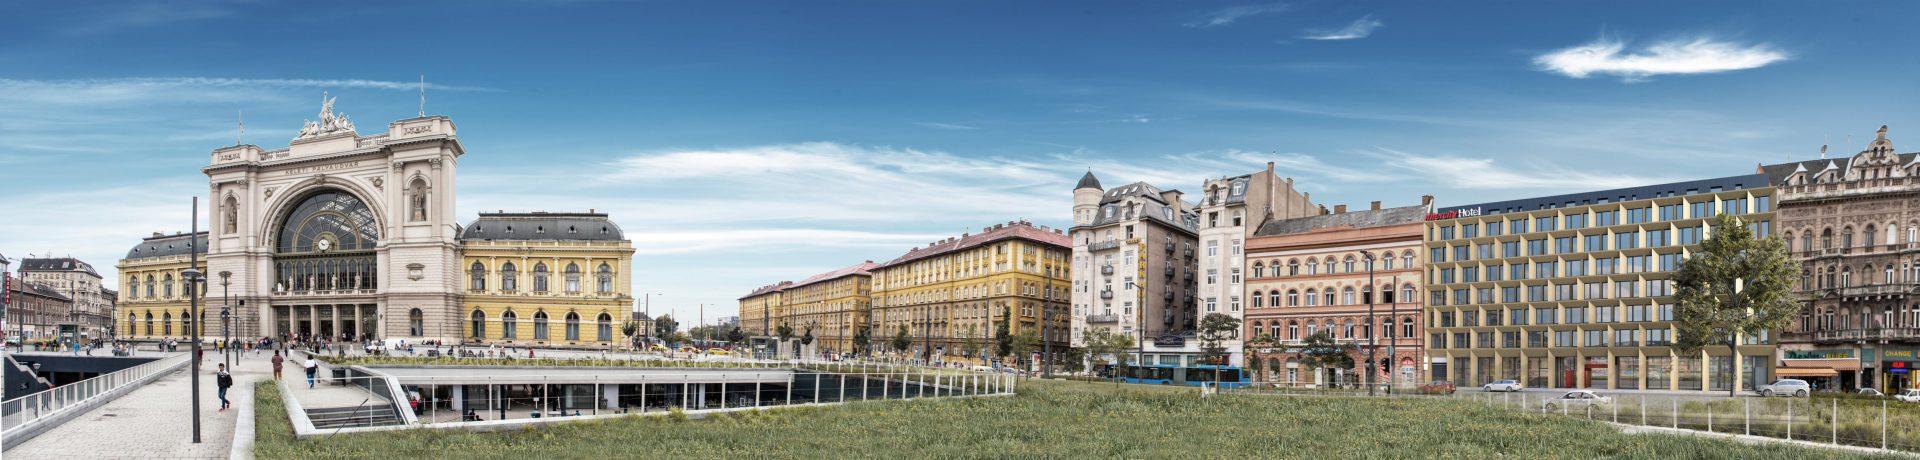 K1600_009_190904-Pano_Hotel